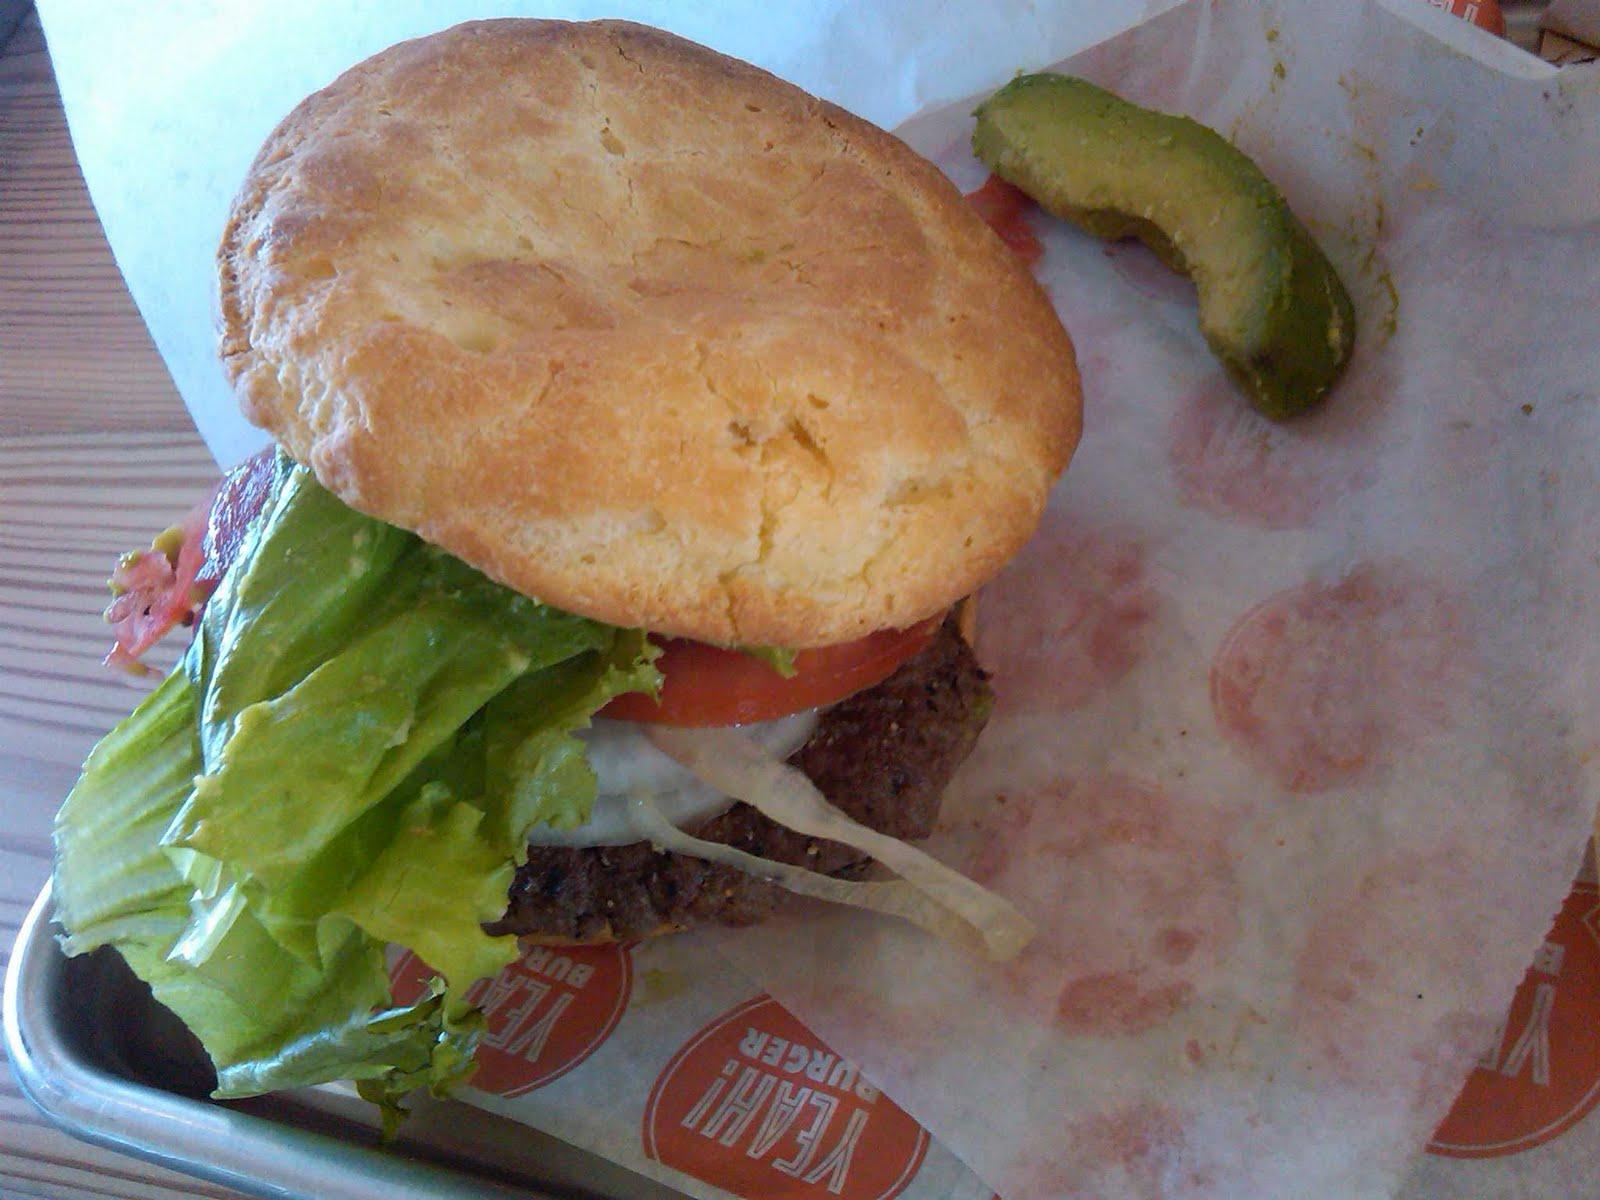 Amazing Wallpaper High Quality Burger - Yeah+Burger+Bun  Image_911223.jpg